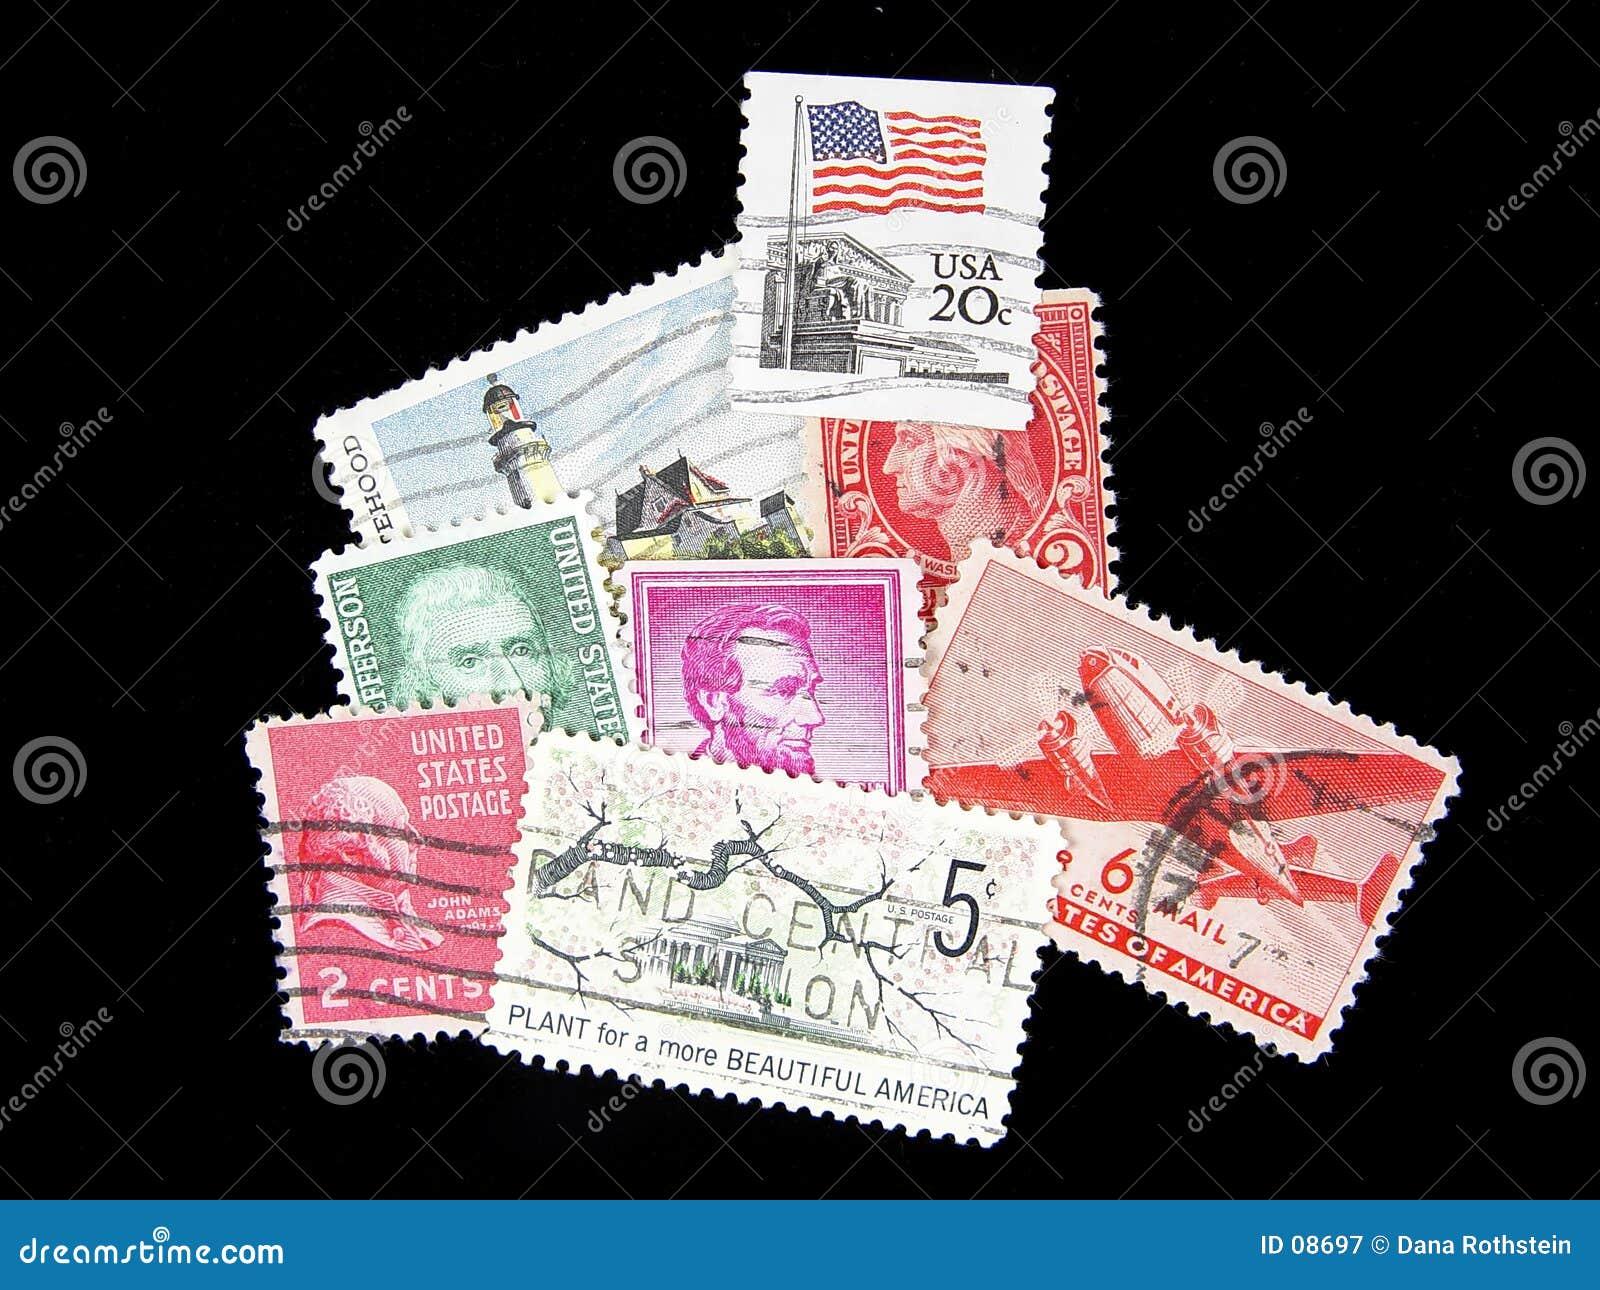 Postage Stamps Mail US Legal Ship Deliver